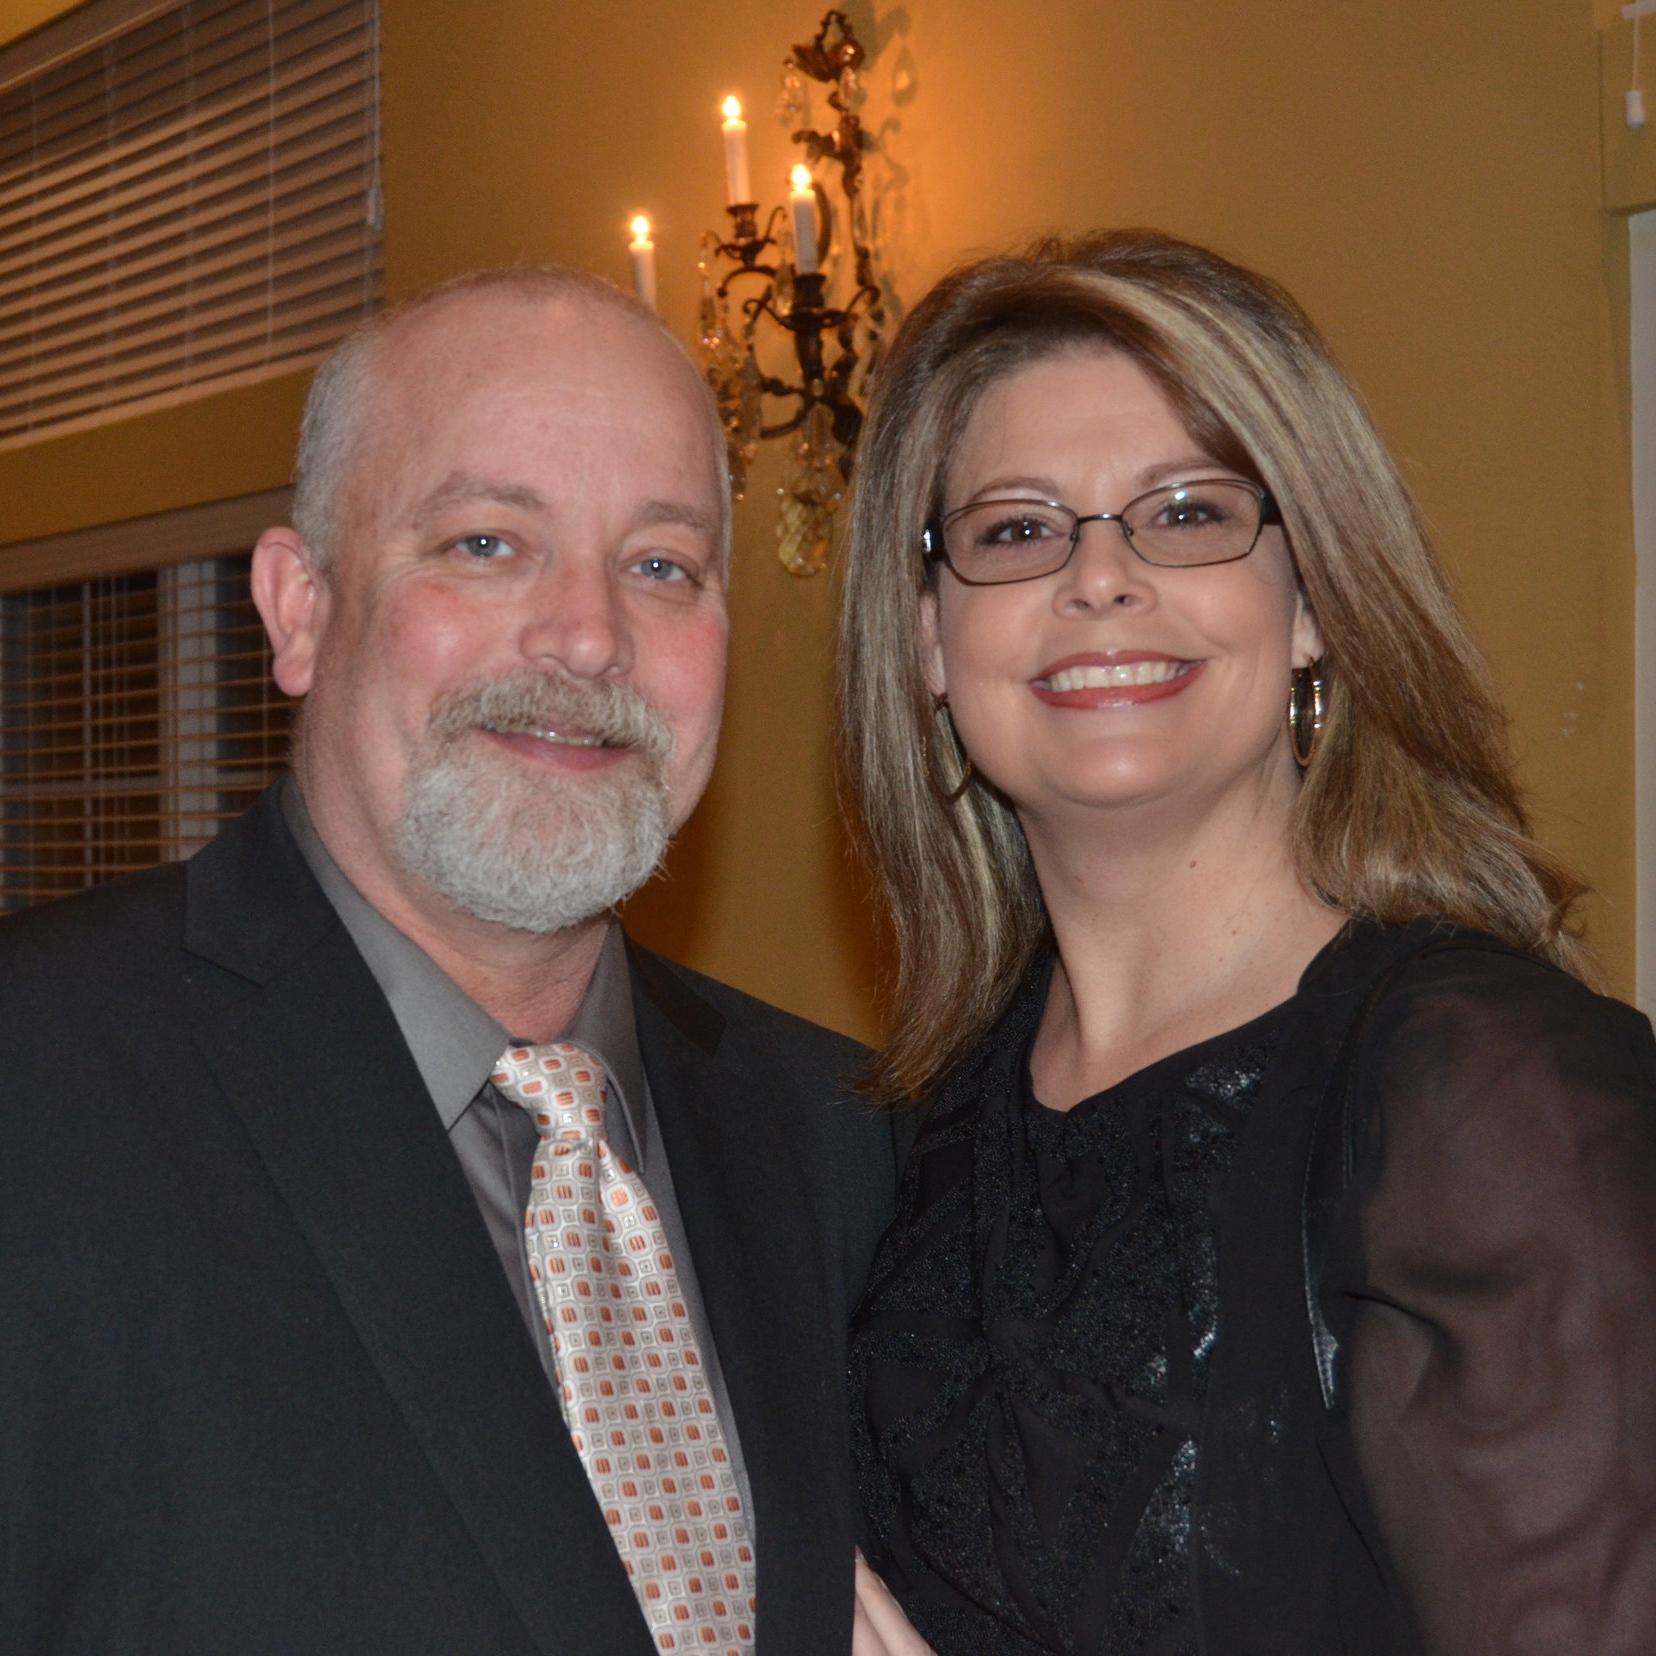 Phillip and Shelley Burkhalter